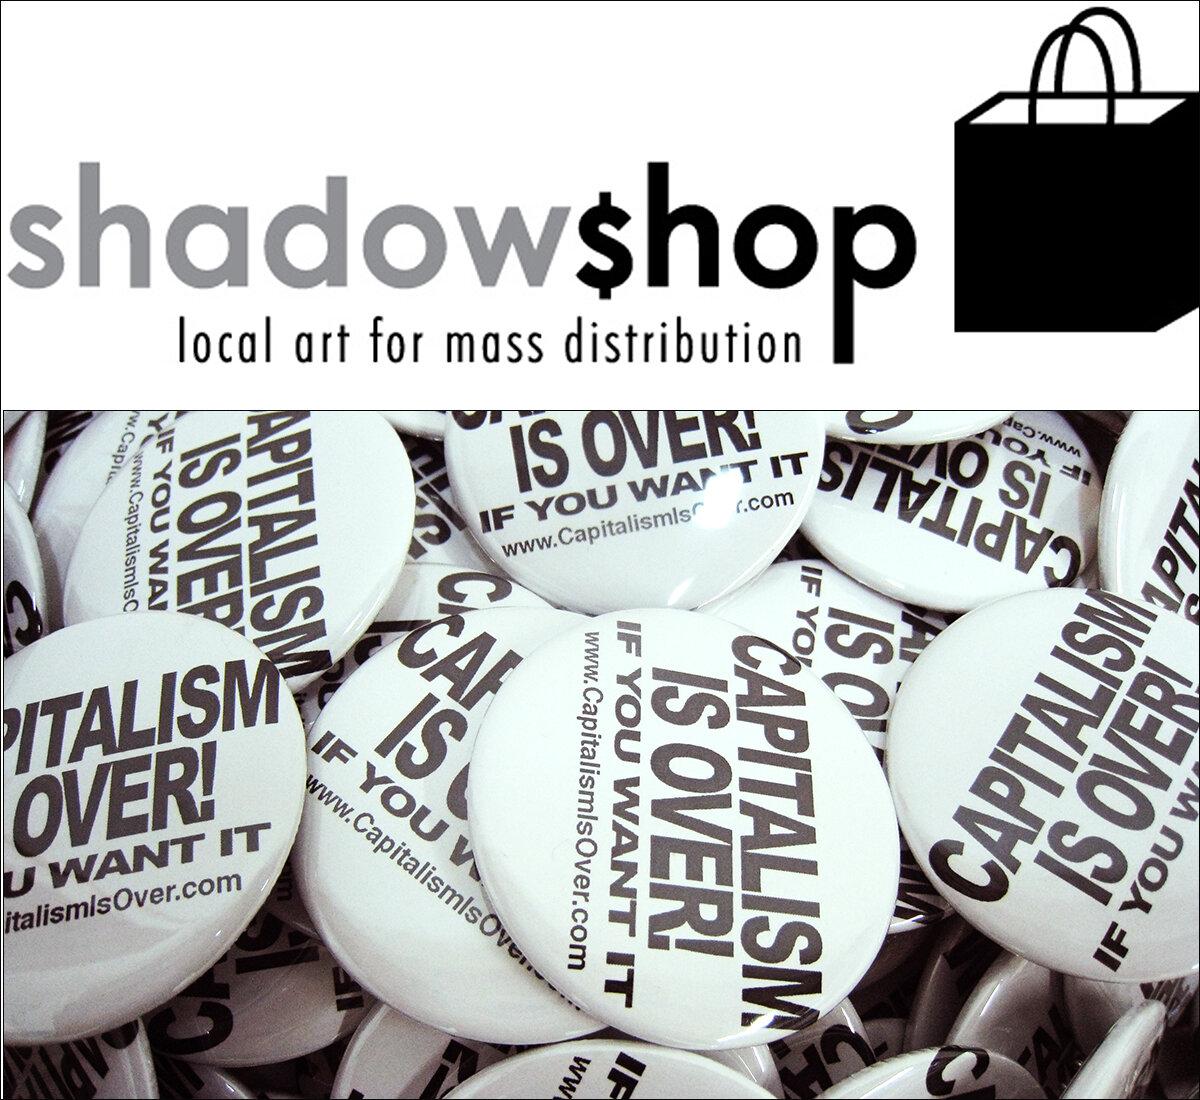 SF MoMA Shadowshop